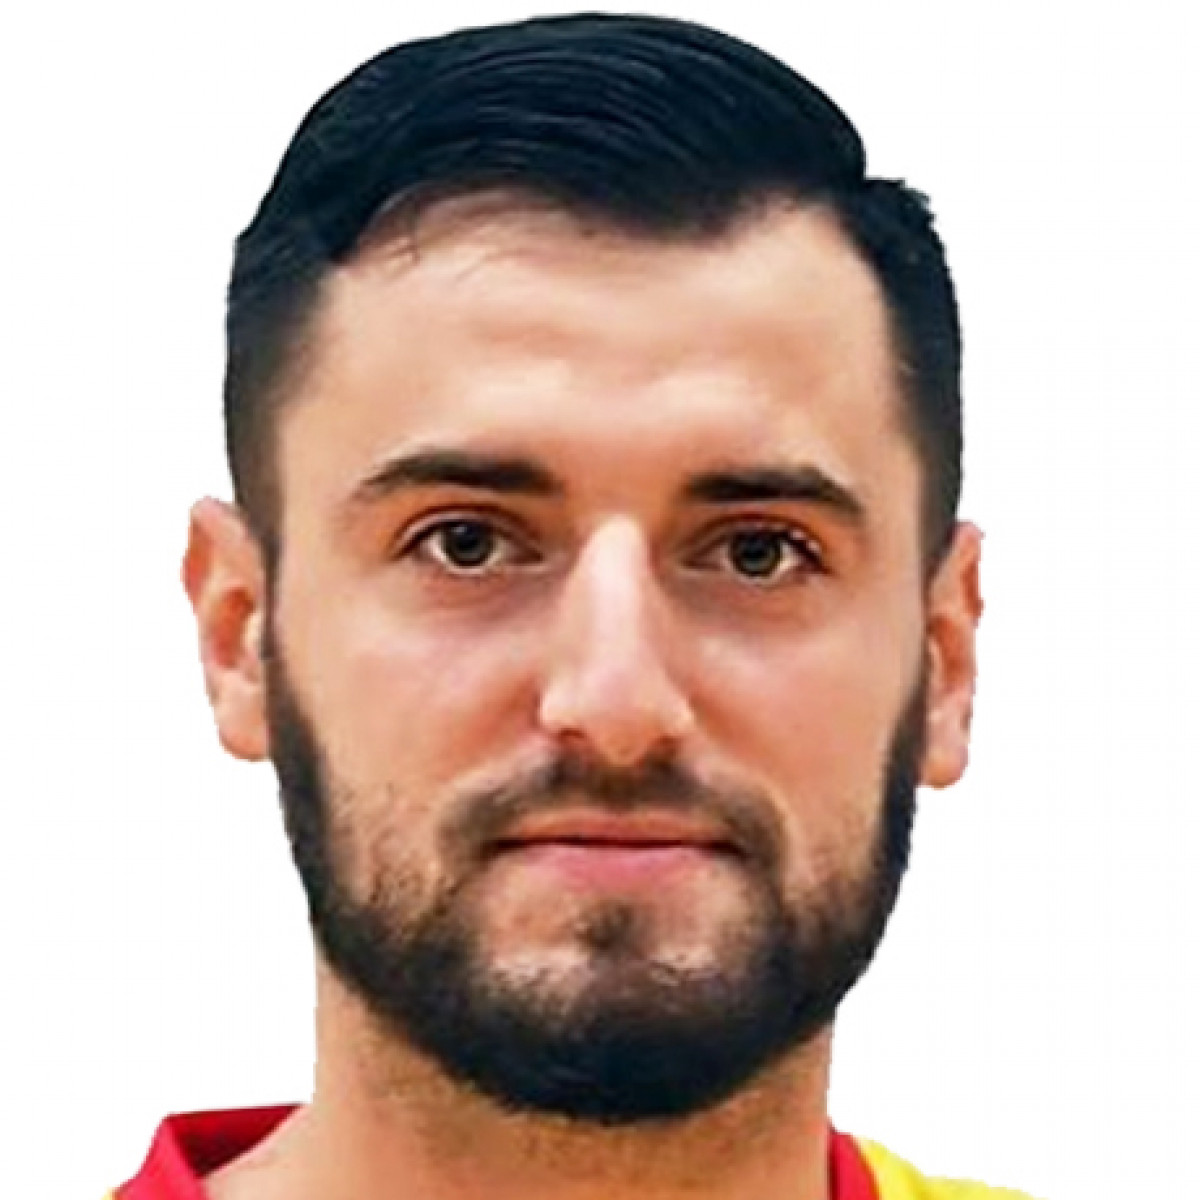 Ognjen Nisavic